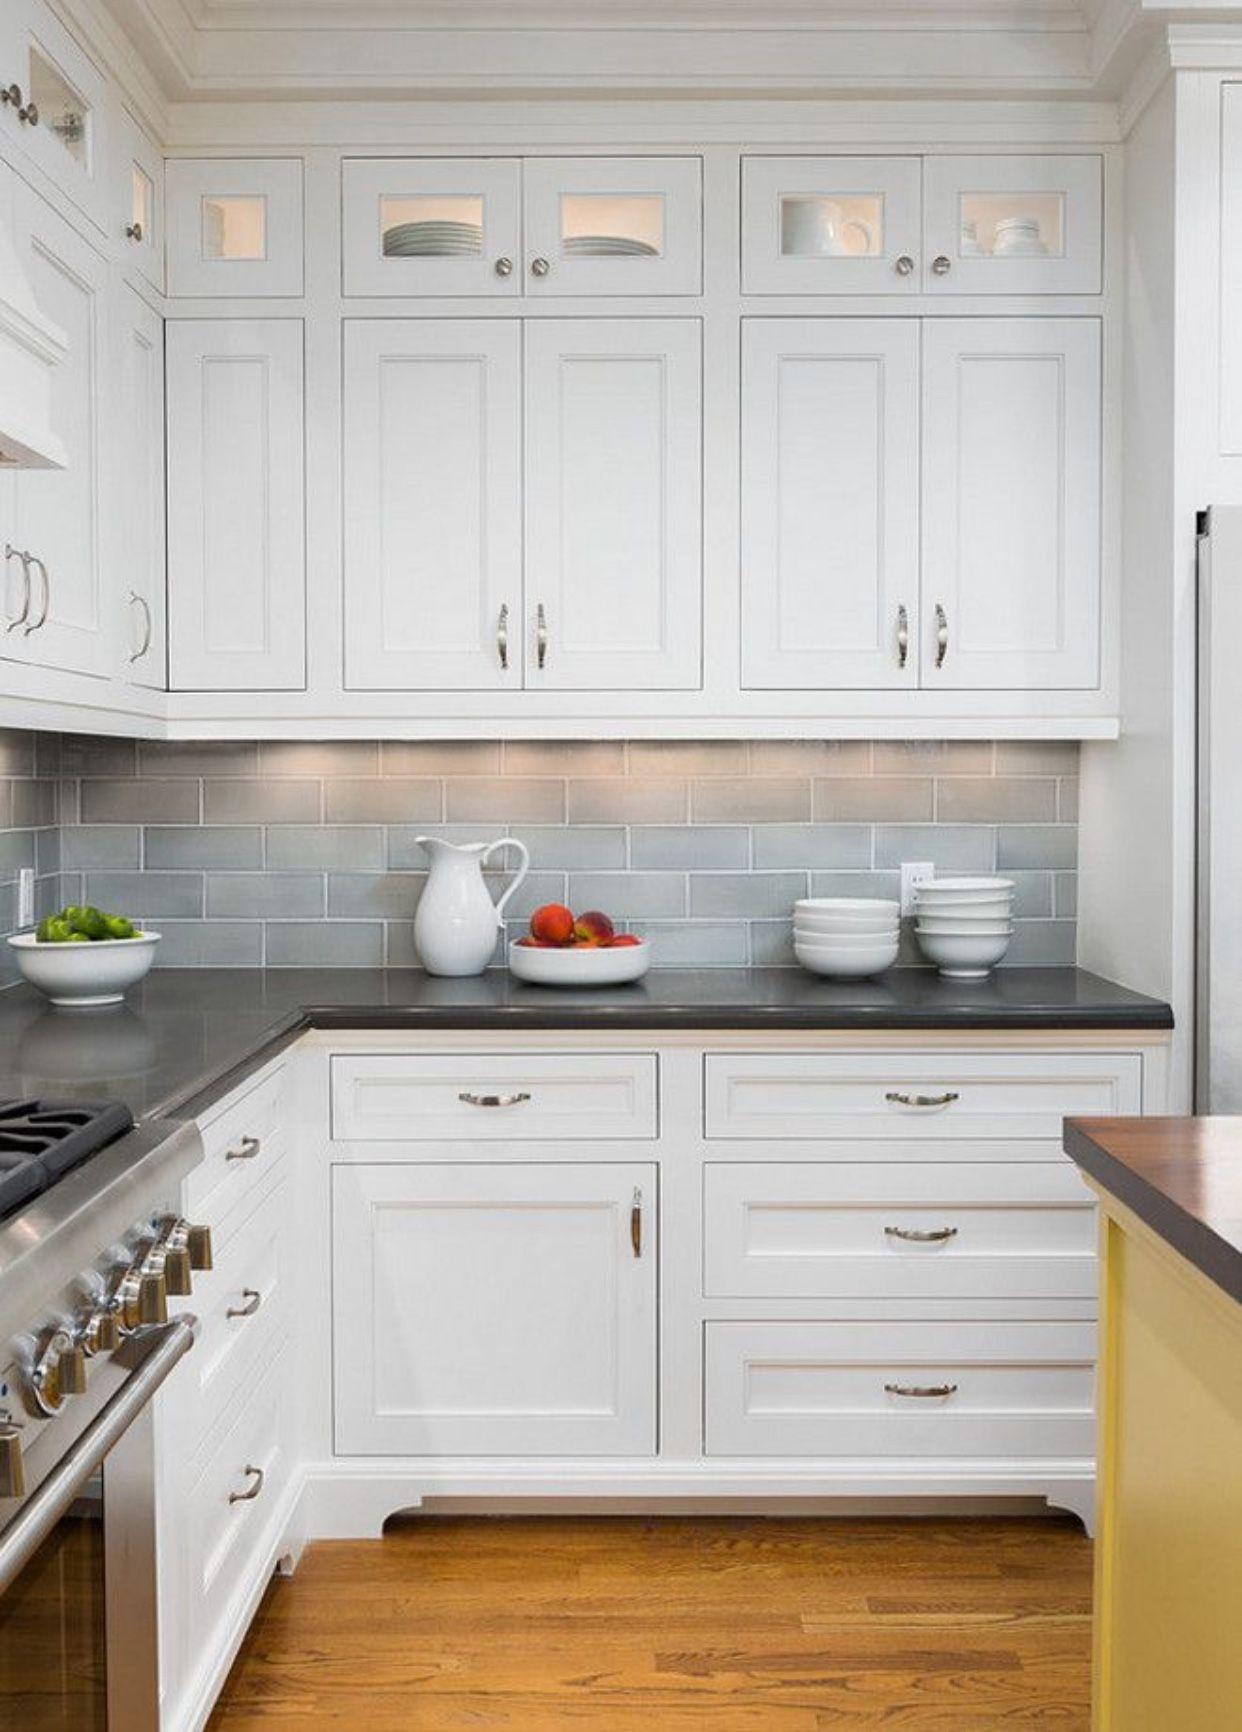 Love The Small Cabinets Up Top Kitchen Cabinets And Backsplash Modern White Kitchen Cabinets Interior Design Kitchen